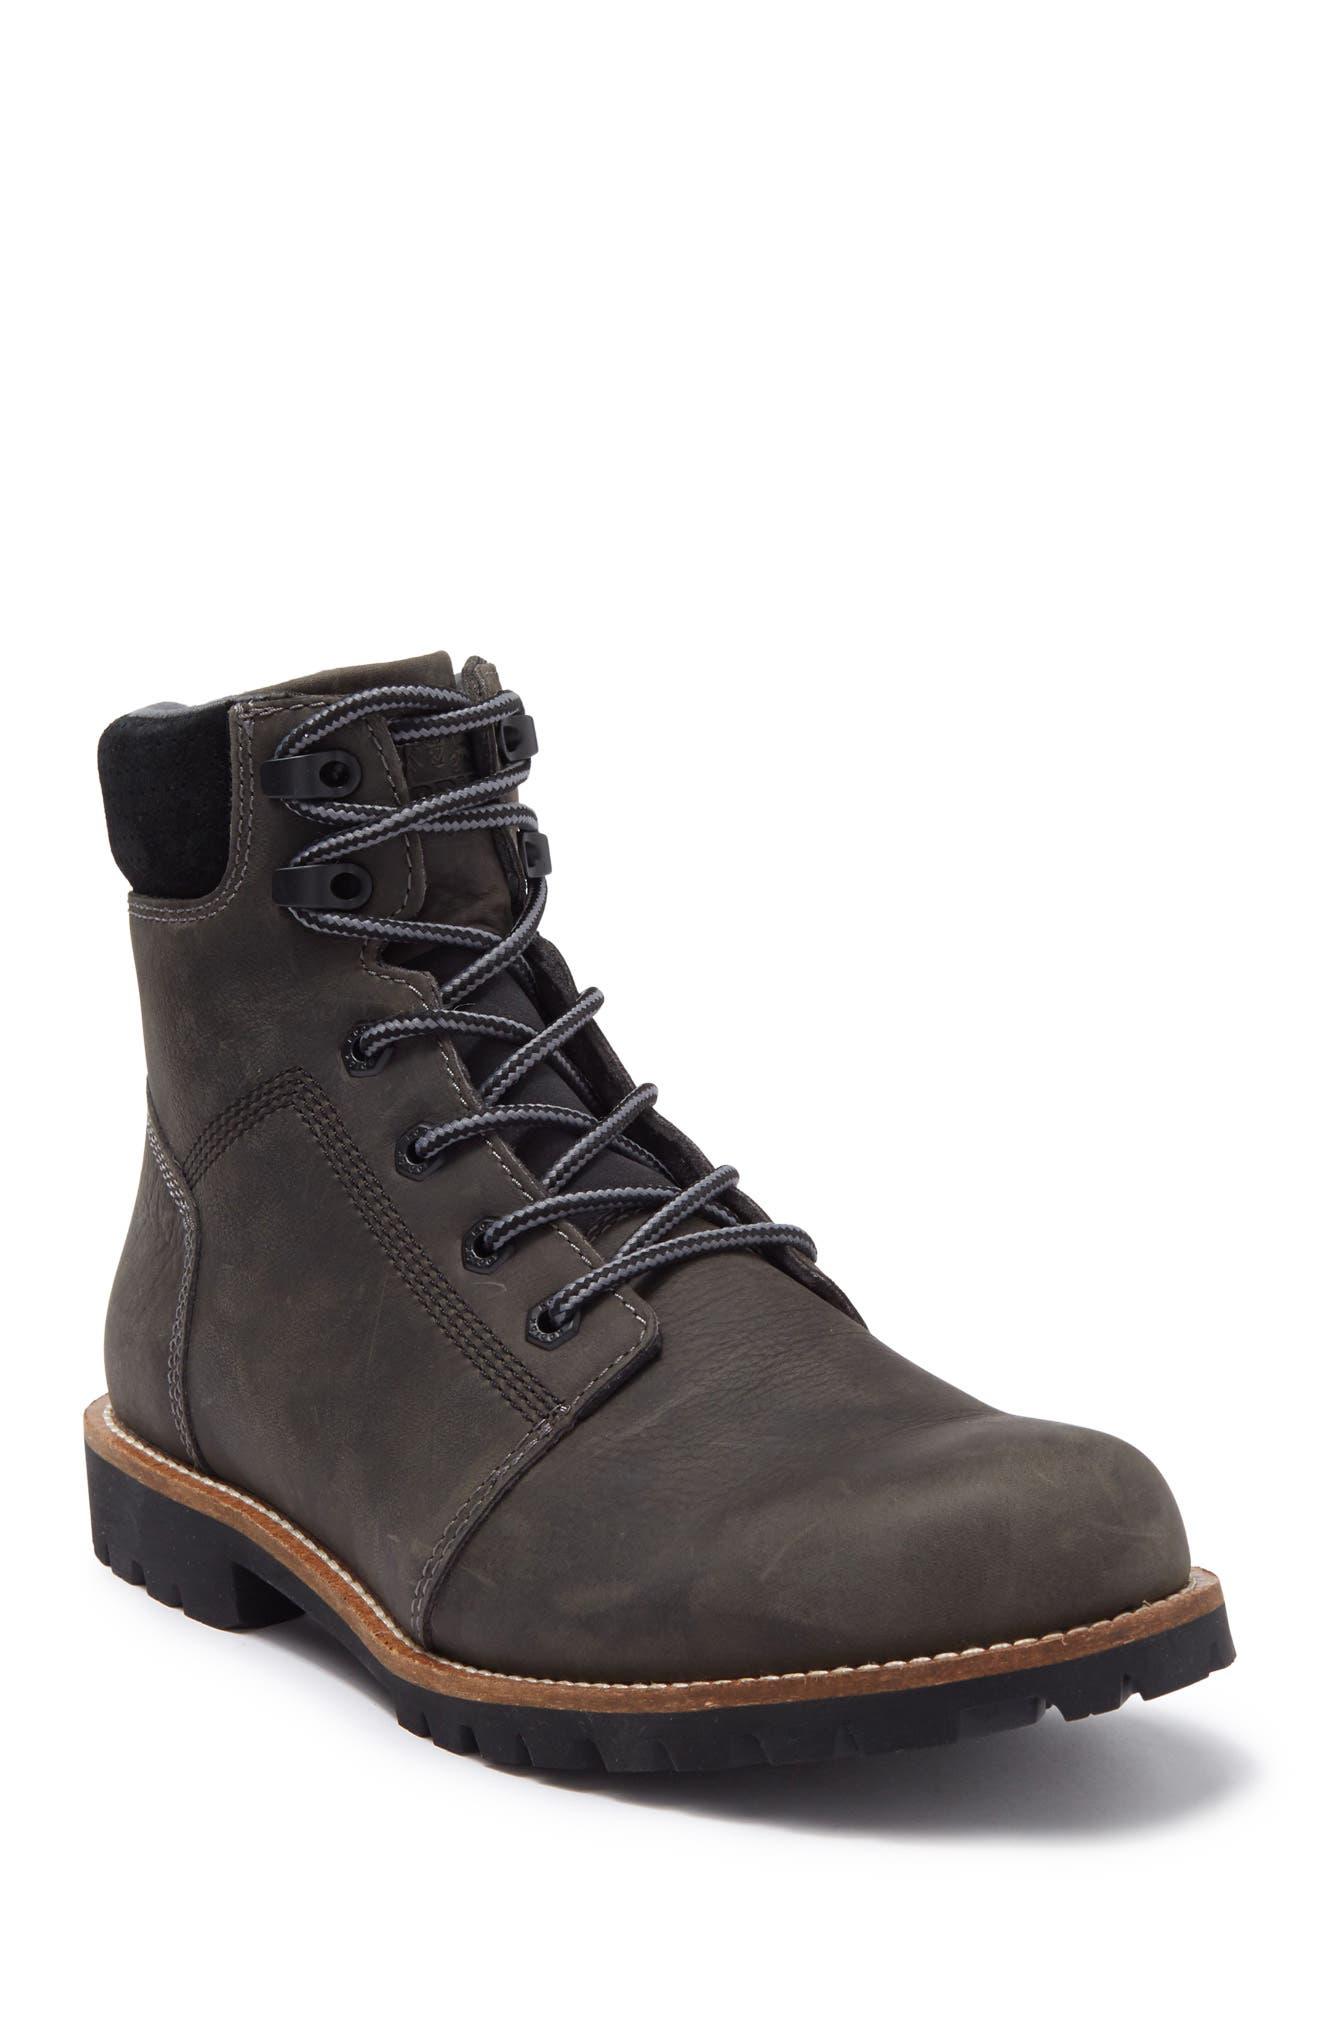 Image of Kodiak Thompson Leather Waterproof Boot